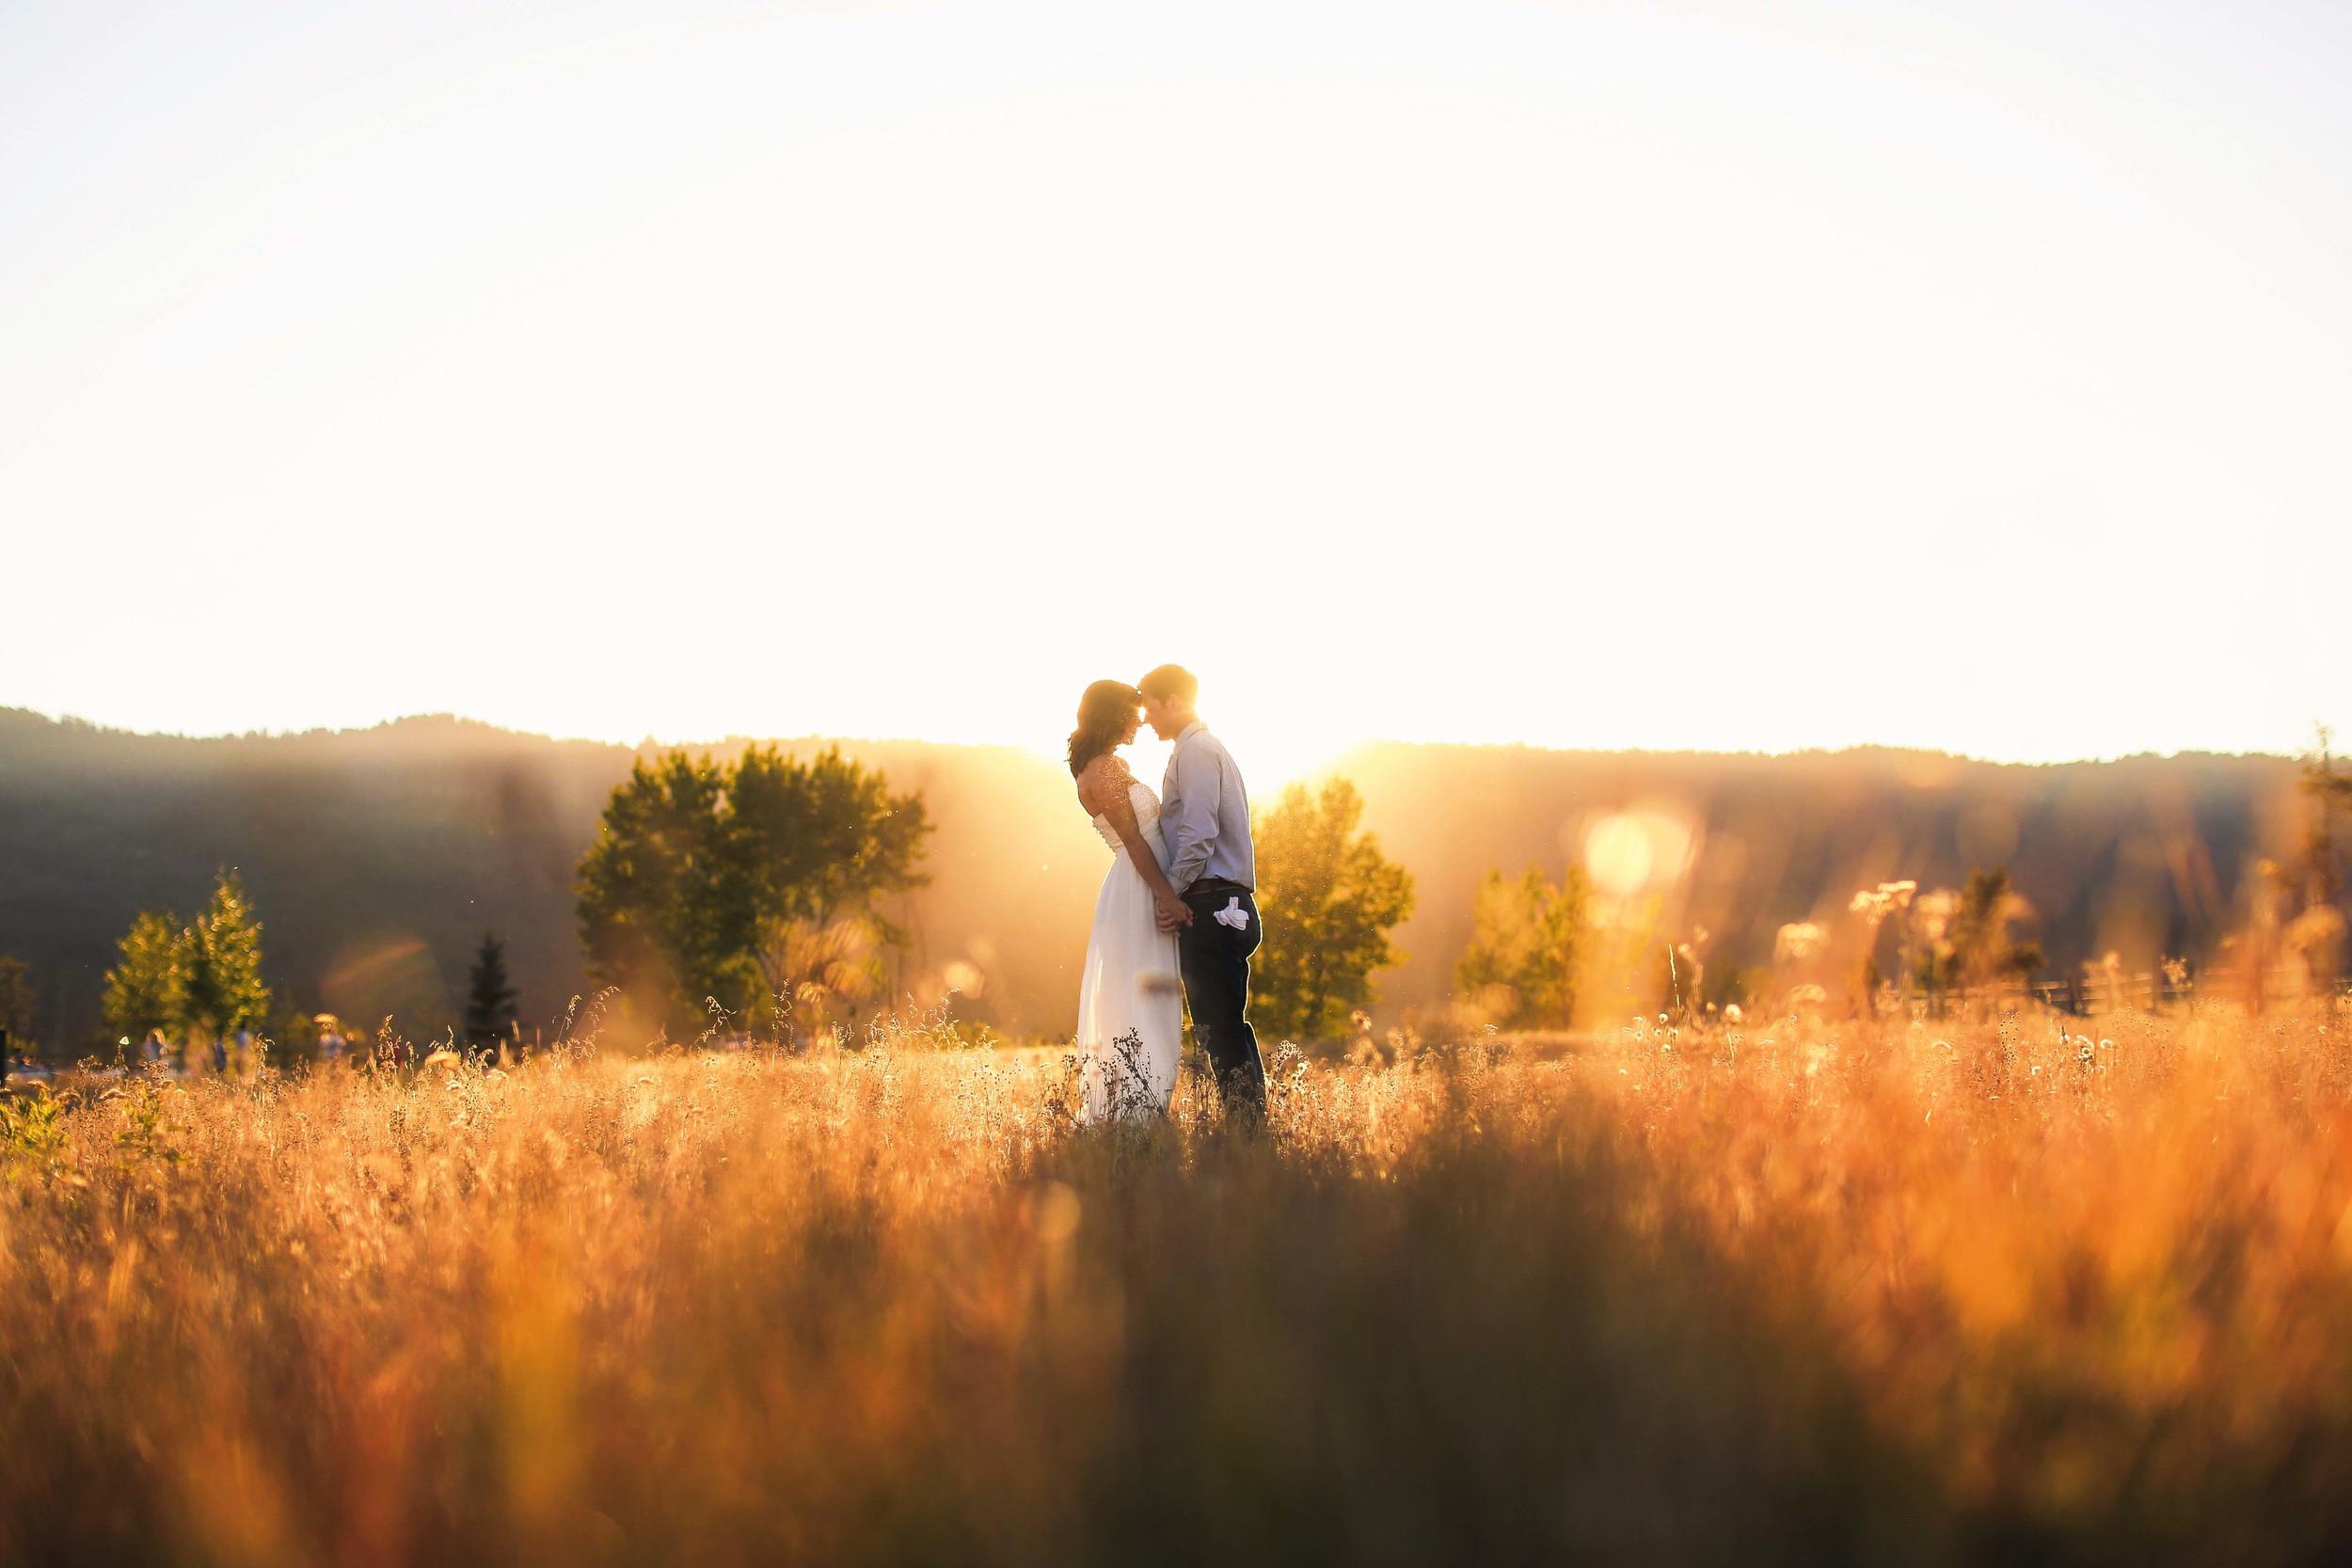 Wedding-146 copy copy.jpg